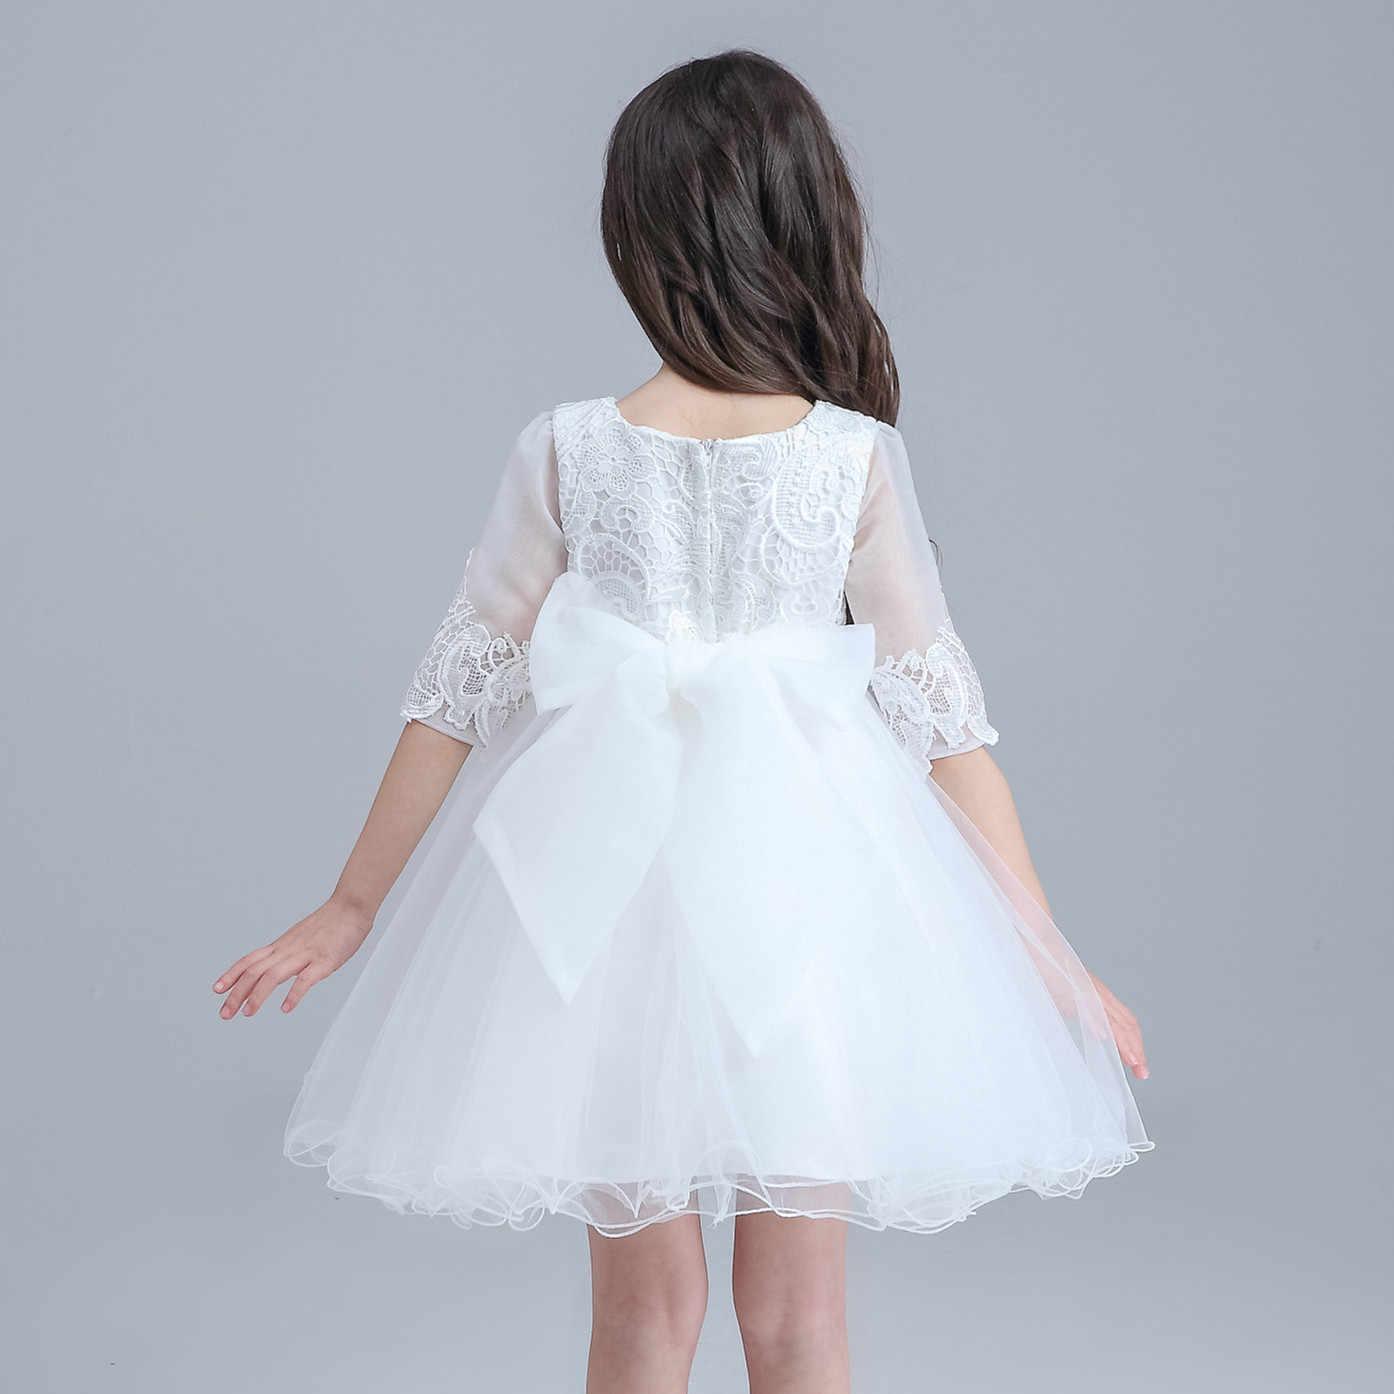 16b6b9ed7 Detail Feedback Questions about White Mini Formal Girl Dress Half ...